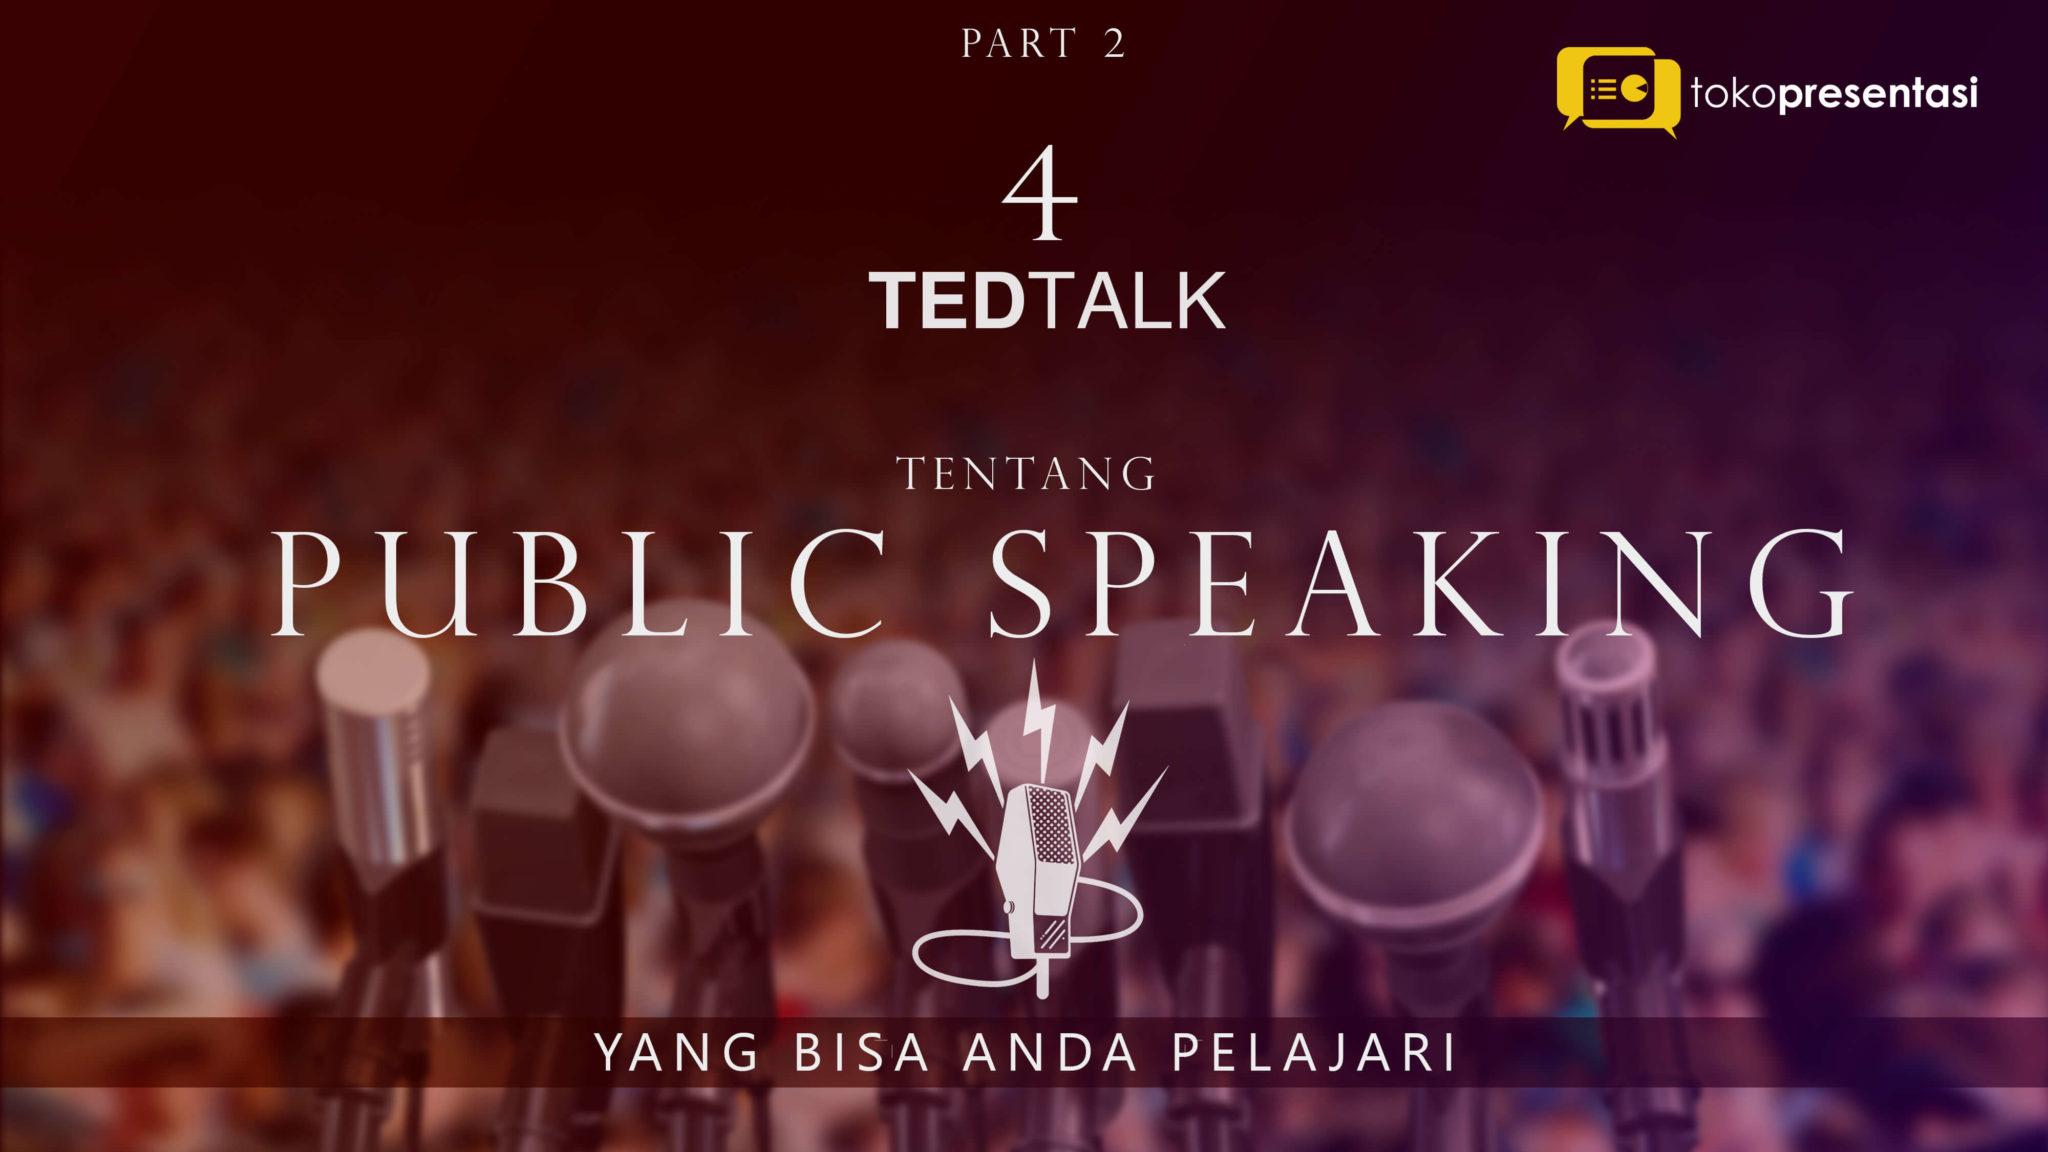 Tips presentasi Training presentasi jasa presentasi 4 TED Talk tentang Presentasi Hebat tokopresentasi.com